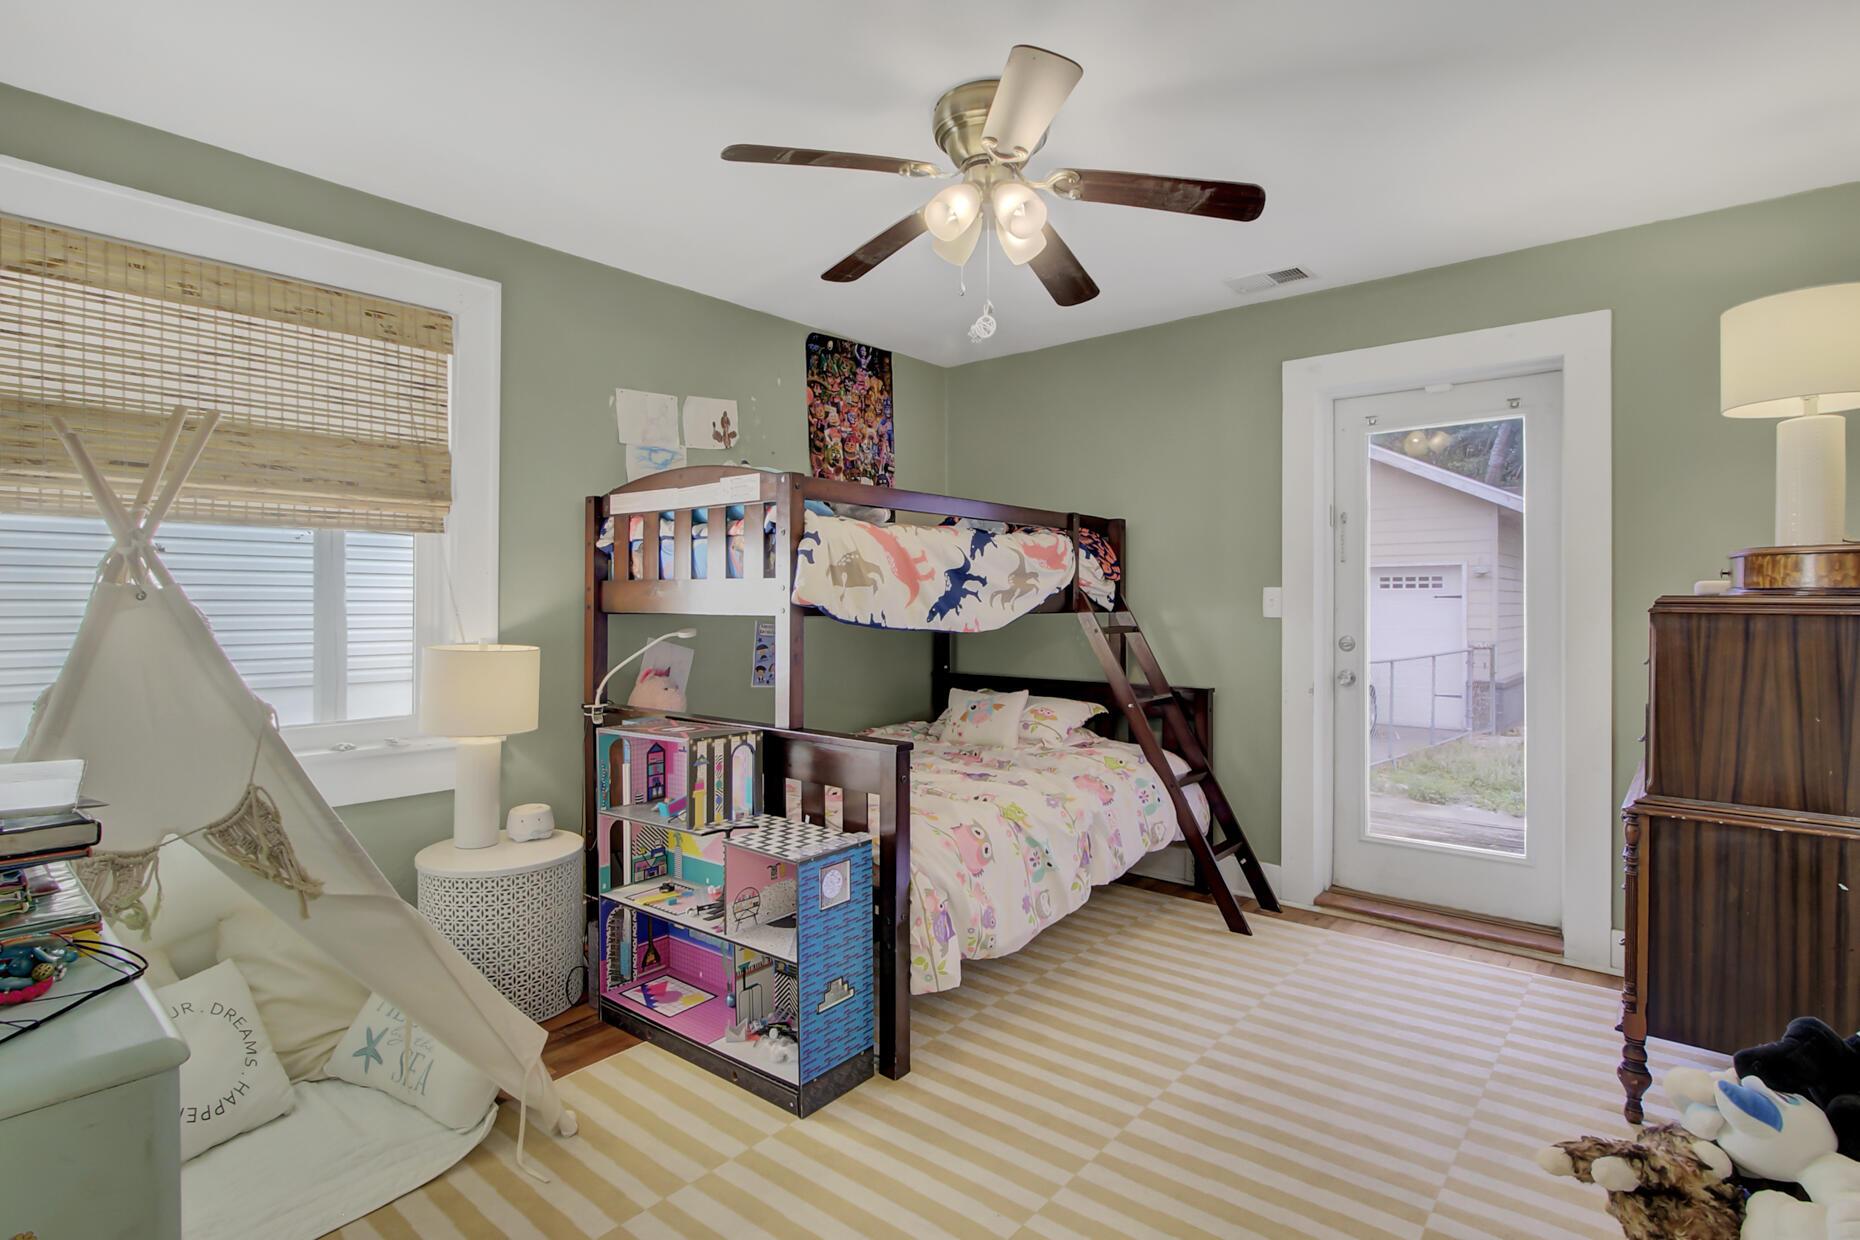 67 Folly Road Boulevard, Charleston, 29407, ,MultiFamily,For Sale,Folly Road,21015426